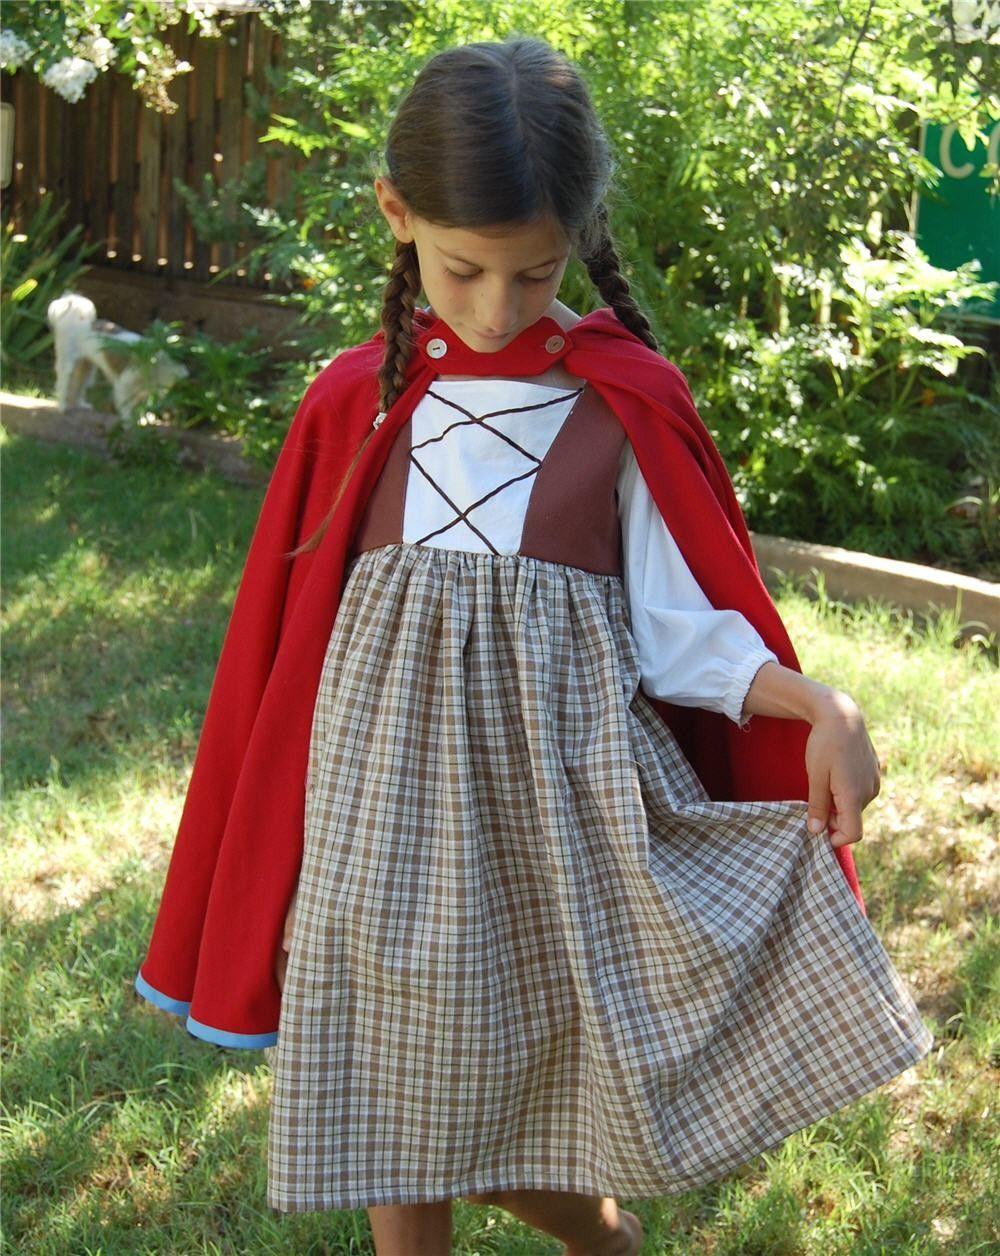 peasant costume - Google Search